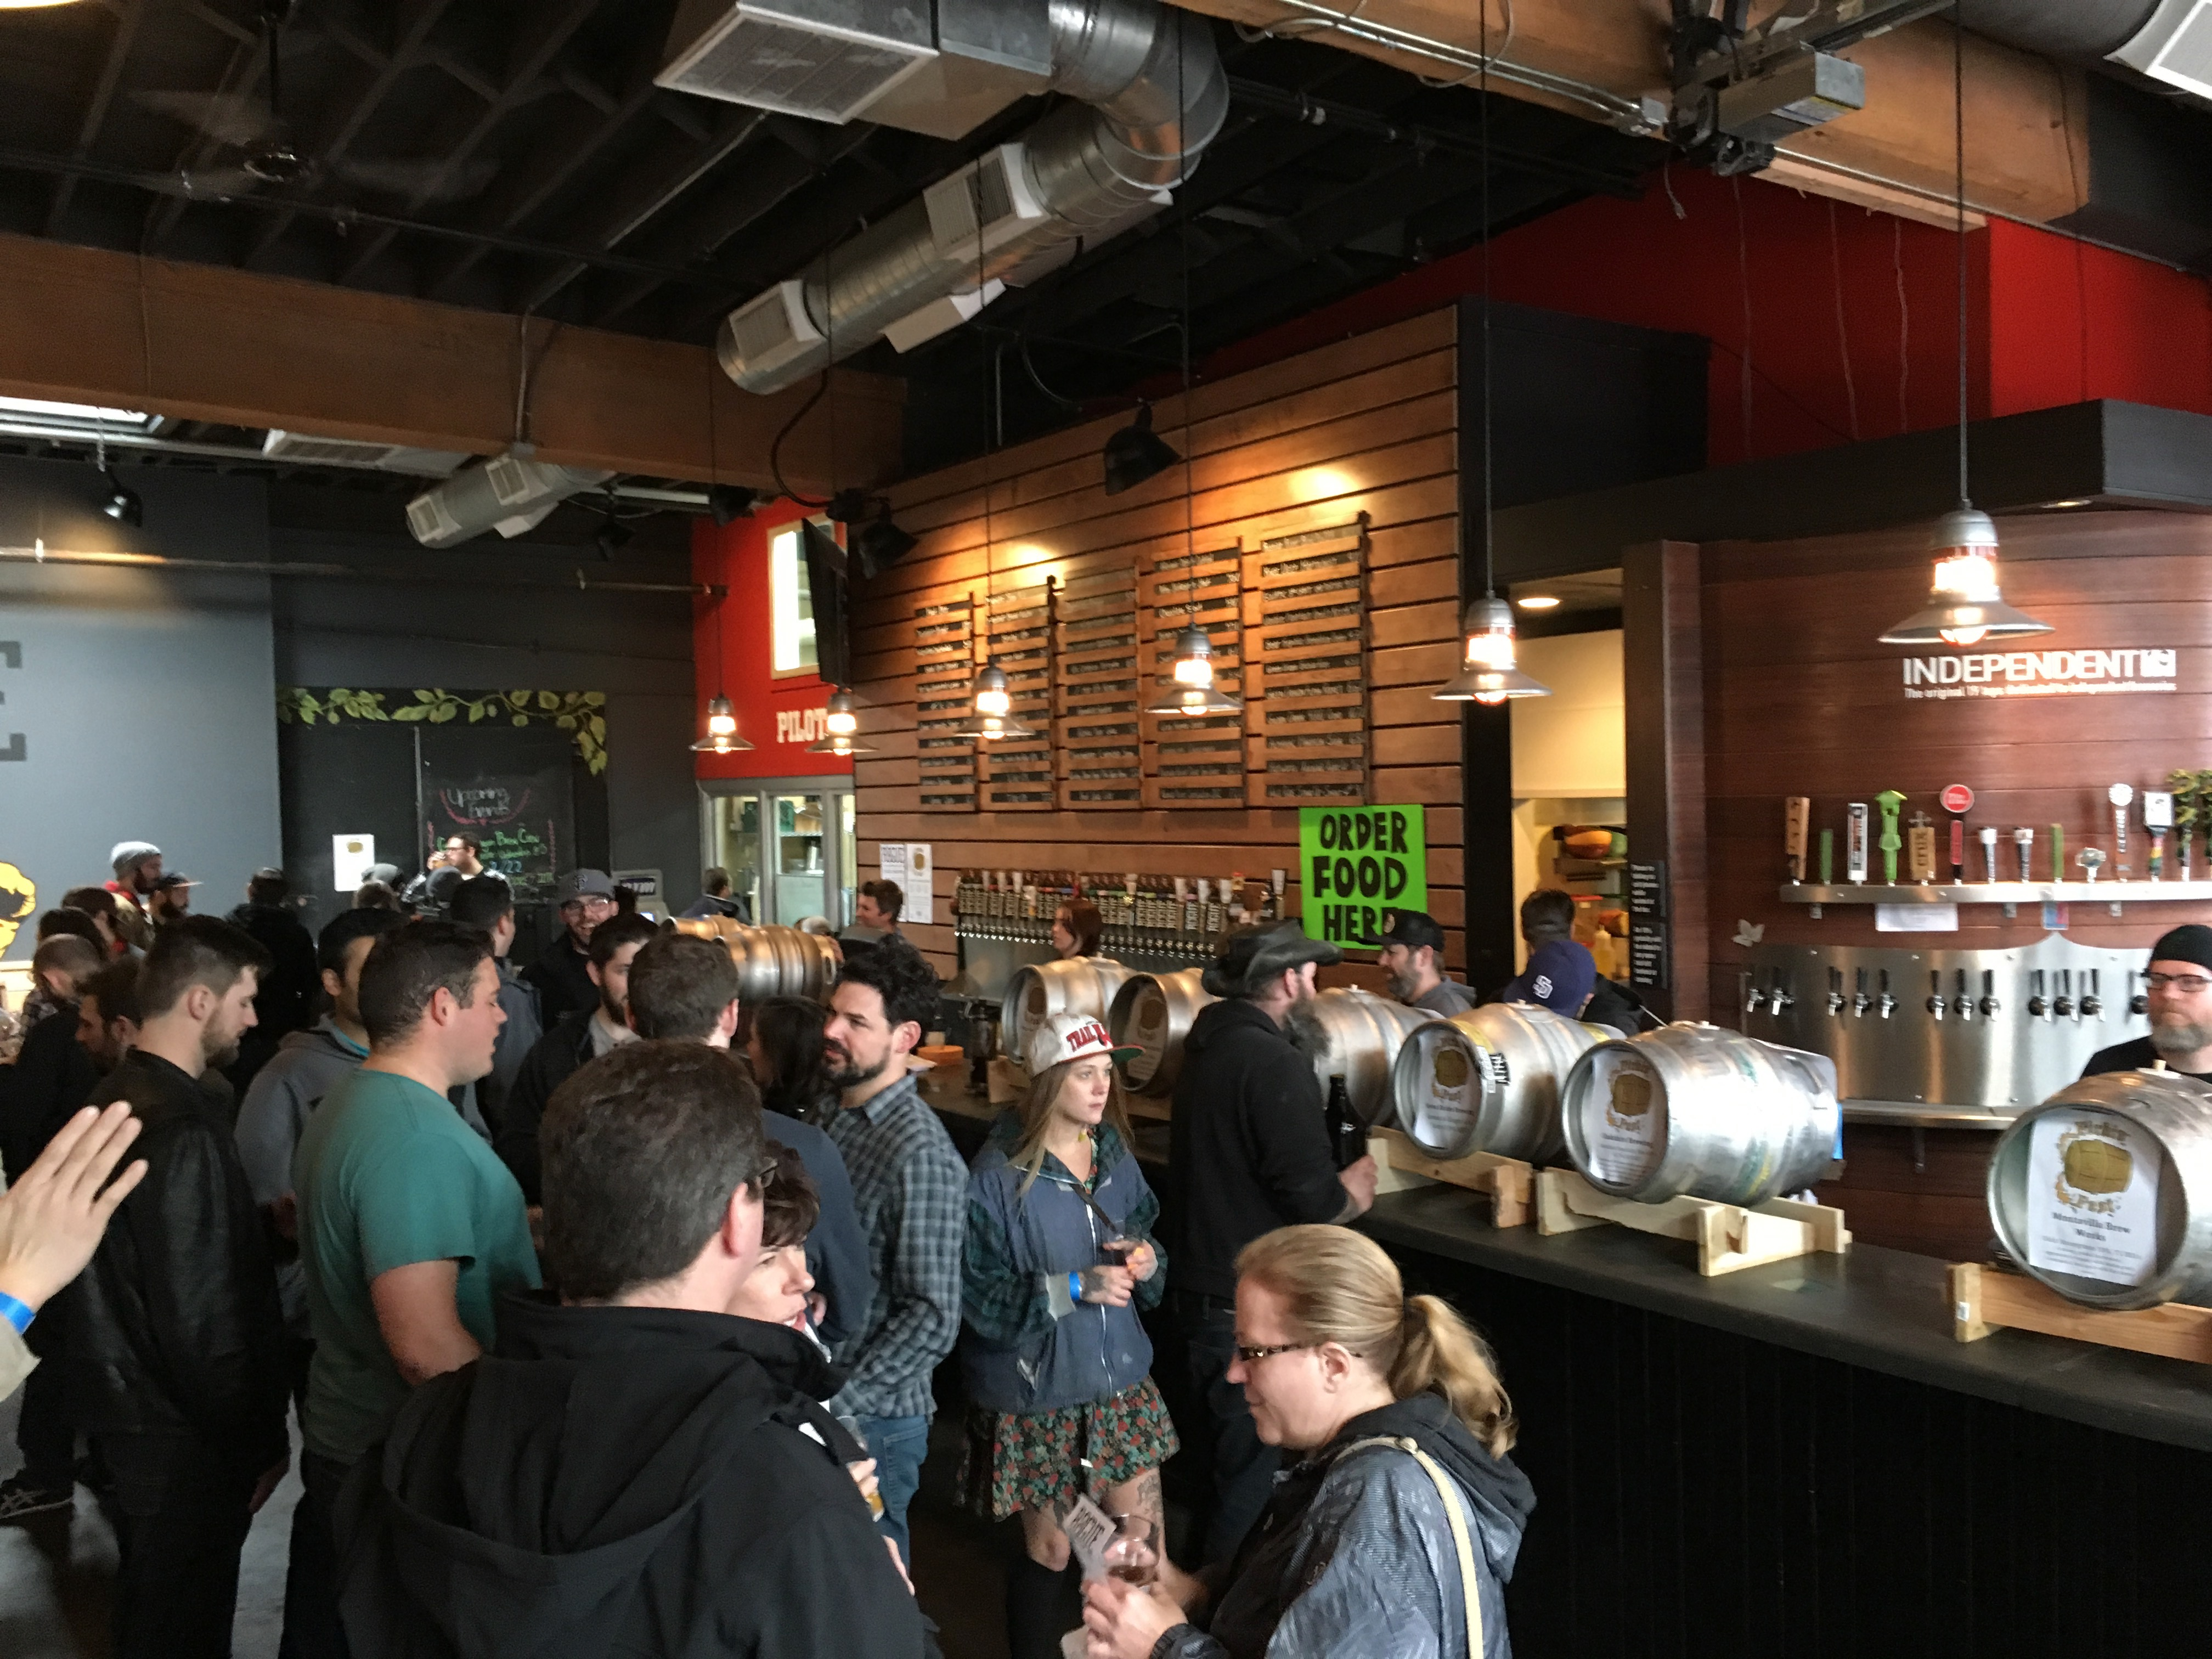 2017 Firkin Fest at Rogue Eastside Pub & Pilot Brewery.